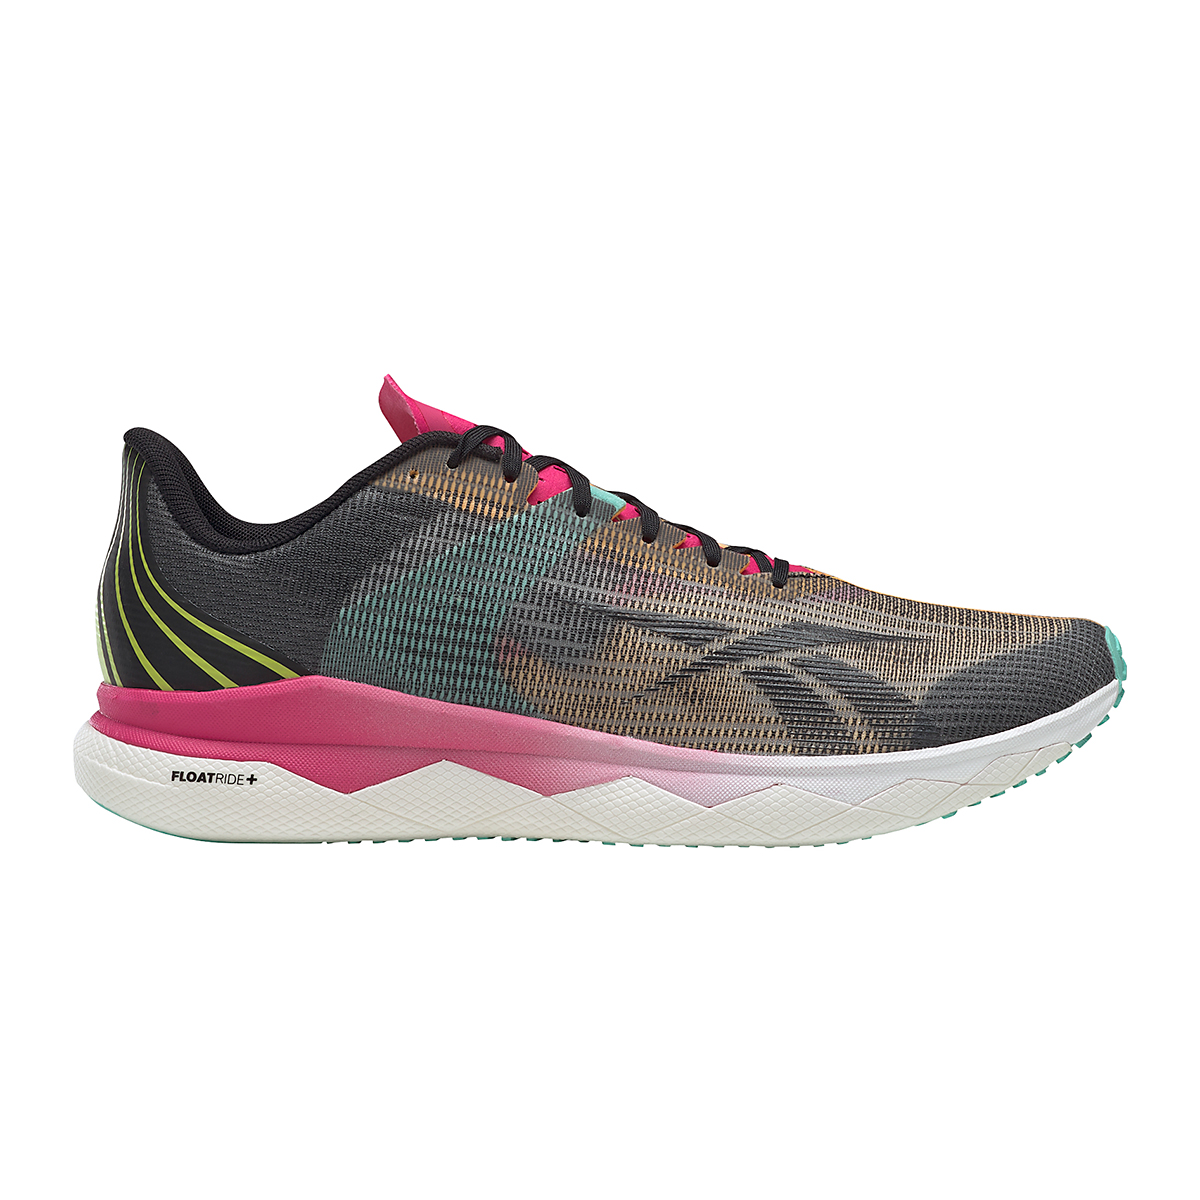 Men's Reebok Floatride Run Fast 3.0 Running Shoe - Color: Black/Purple Pink - Size: 7 - Width: Regular, Black/Purple Pink, large, image 1